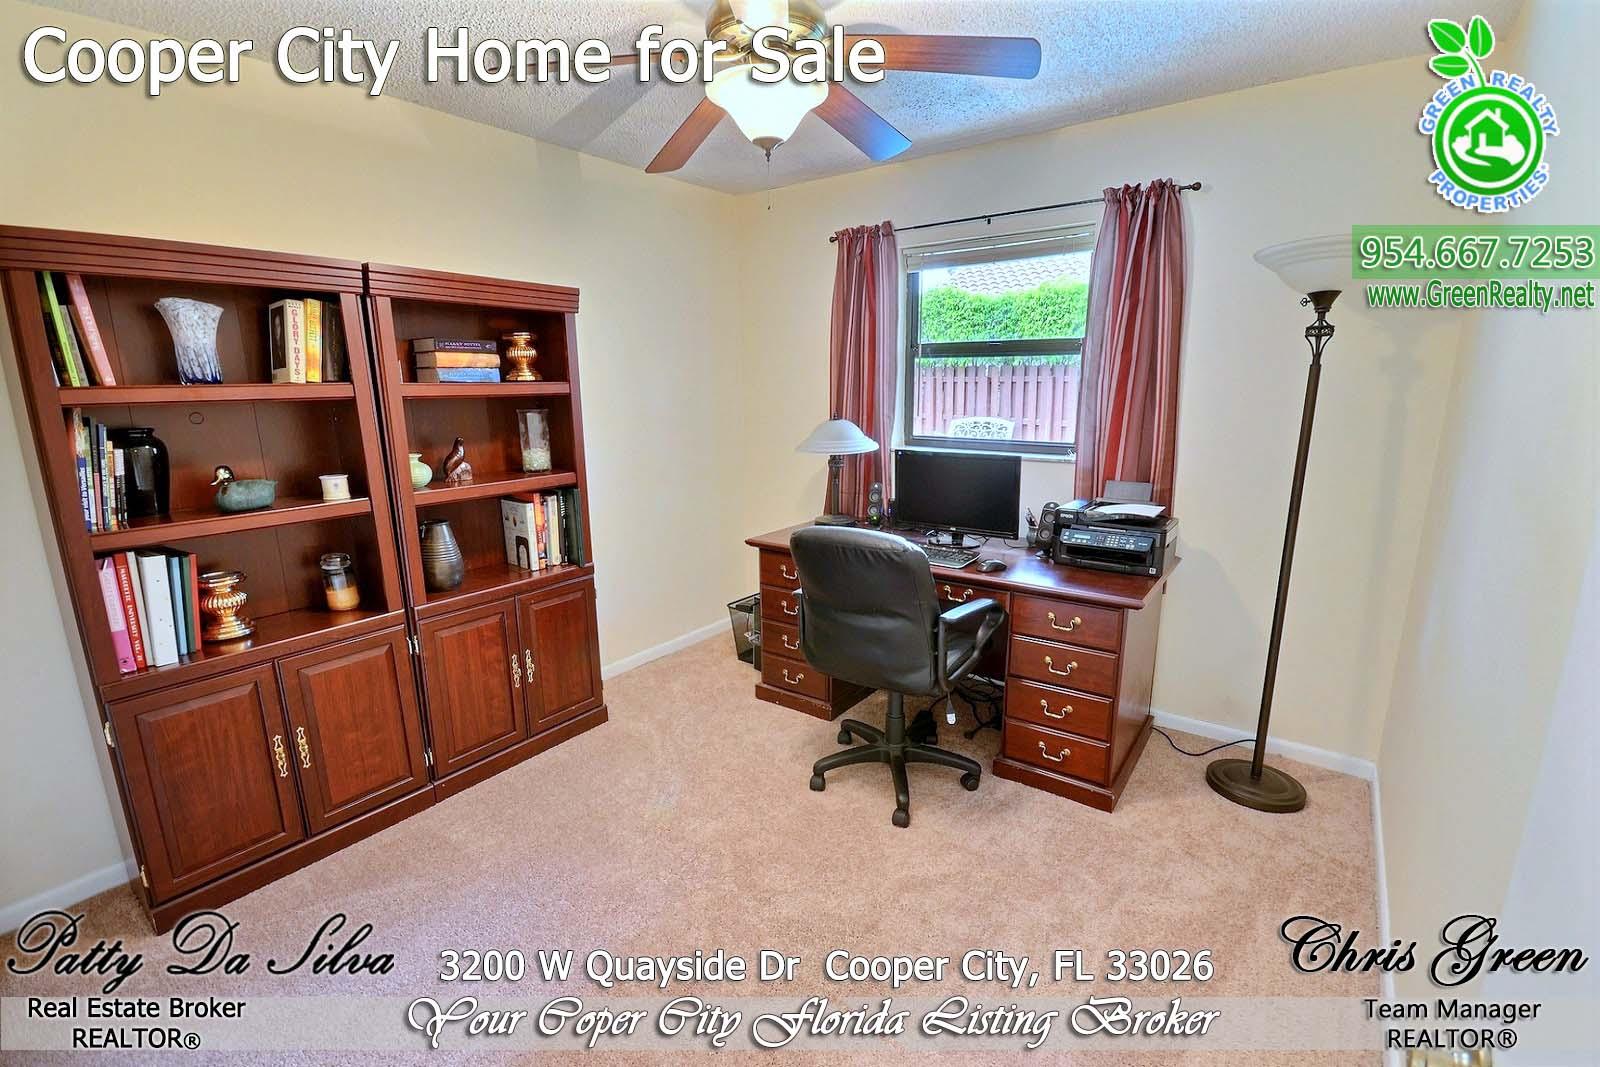 26 Cooper City Homes (6)